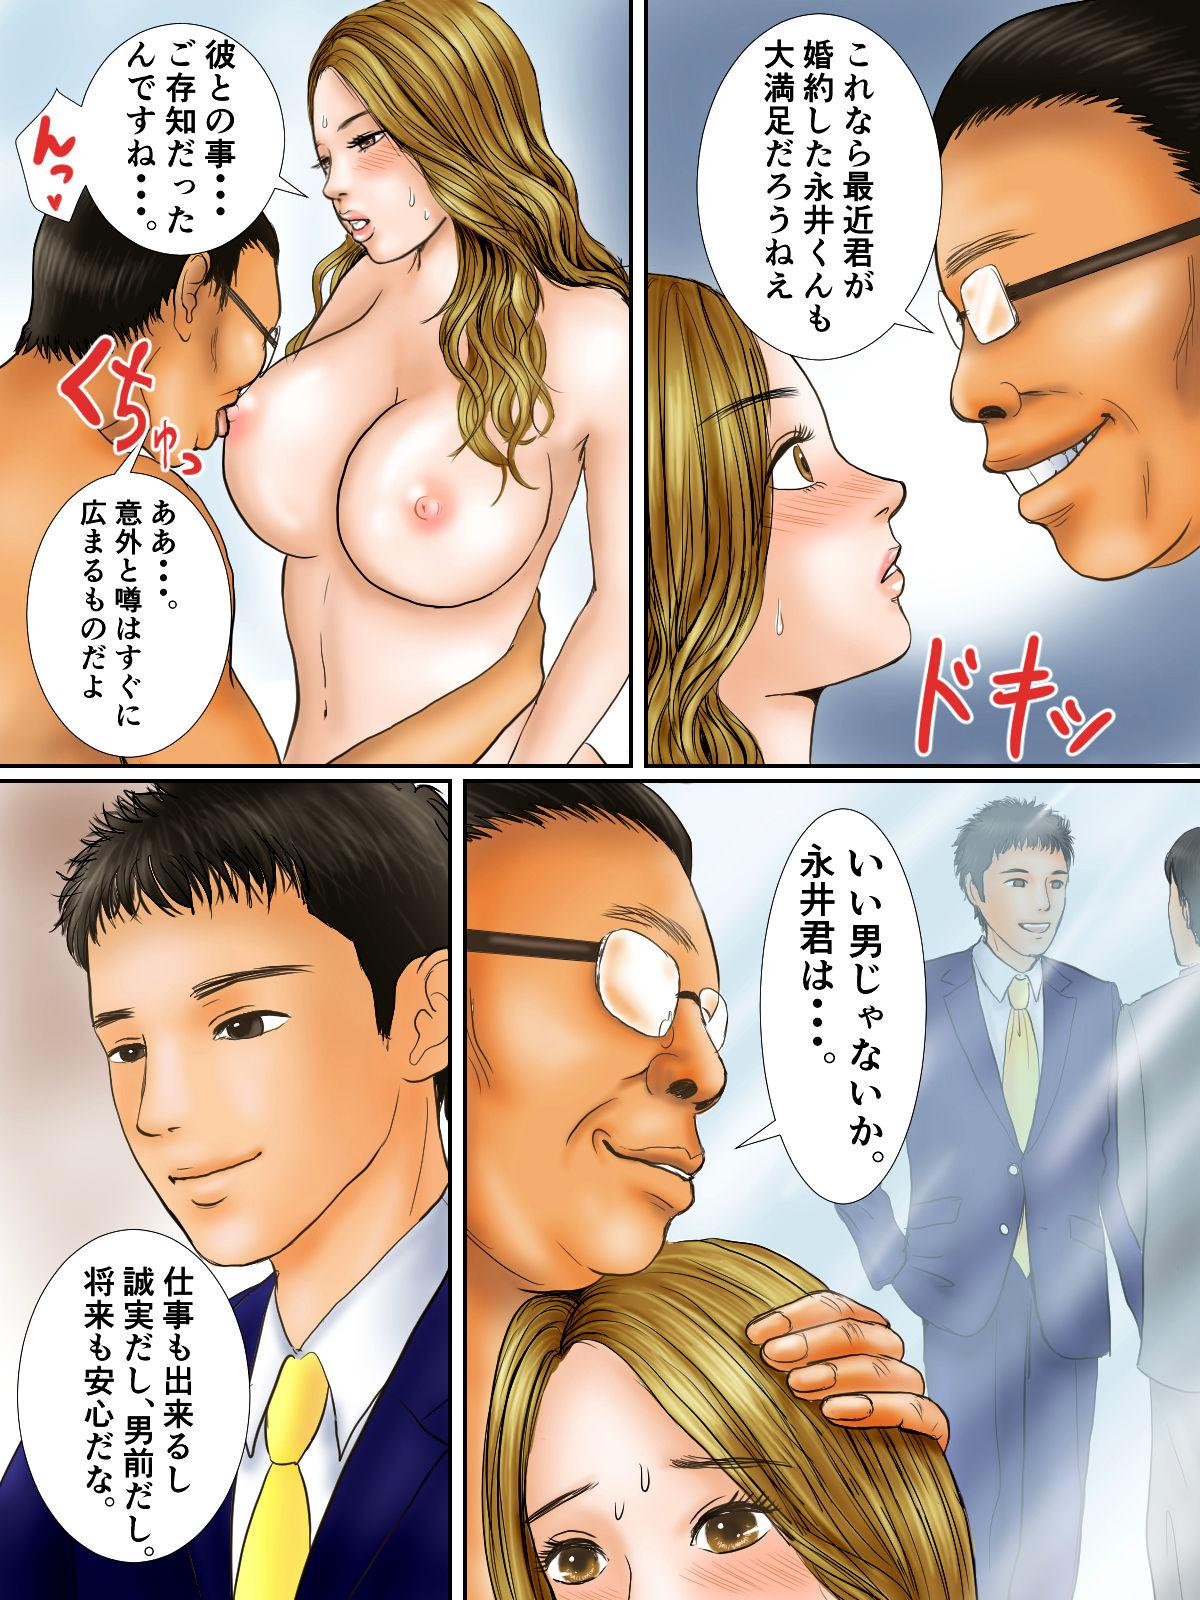 Yuumei Kigyou no Jittai 23